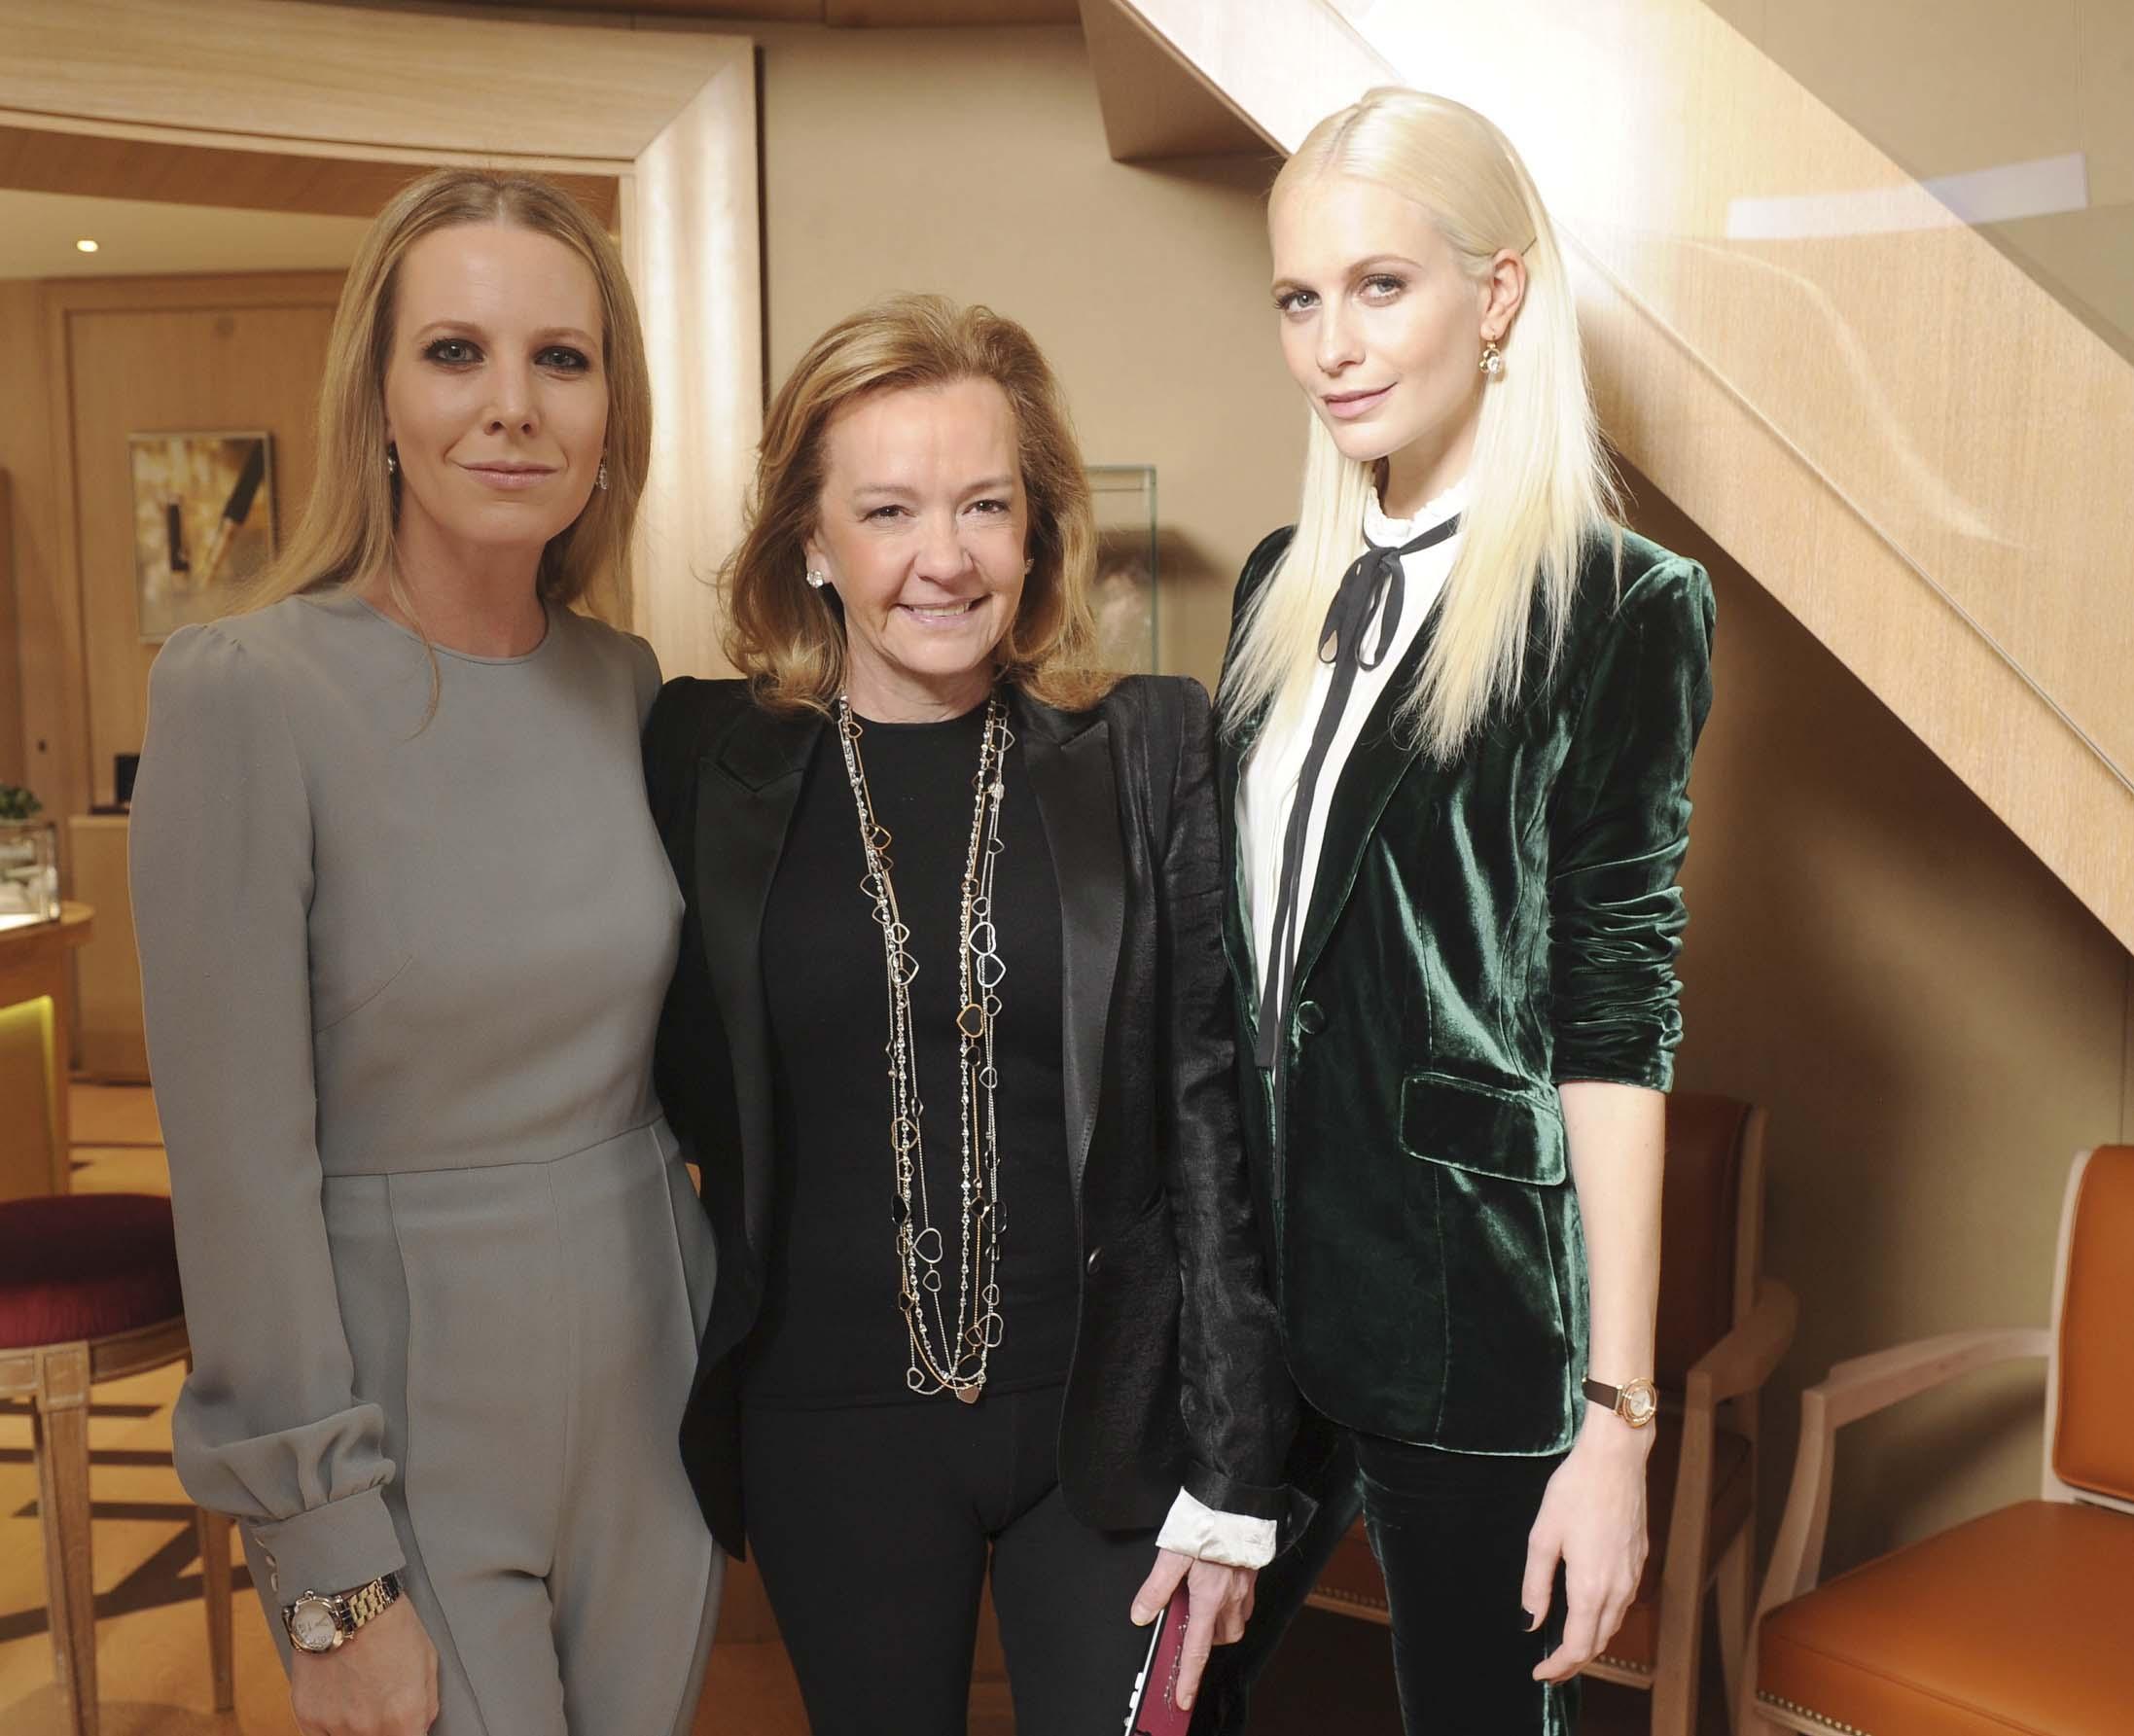 Alice Naylor Leyland;Caroline Scheufele;Poppy Delavigne